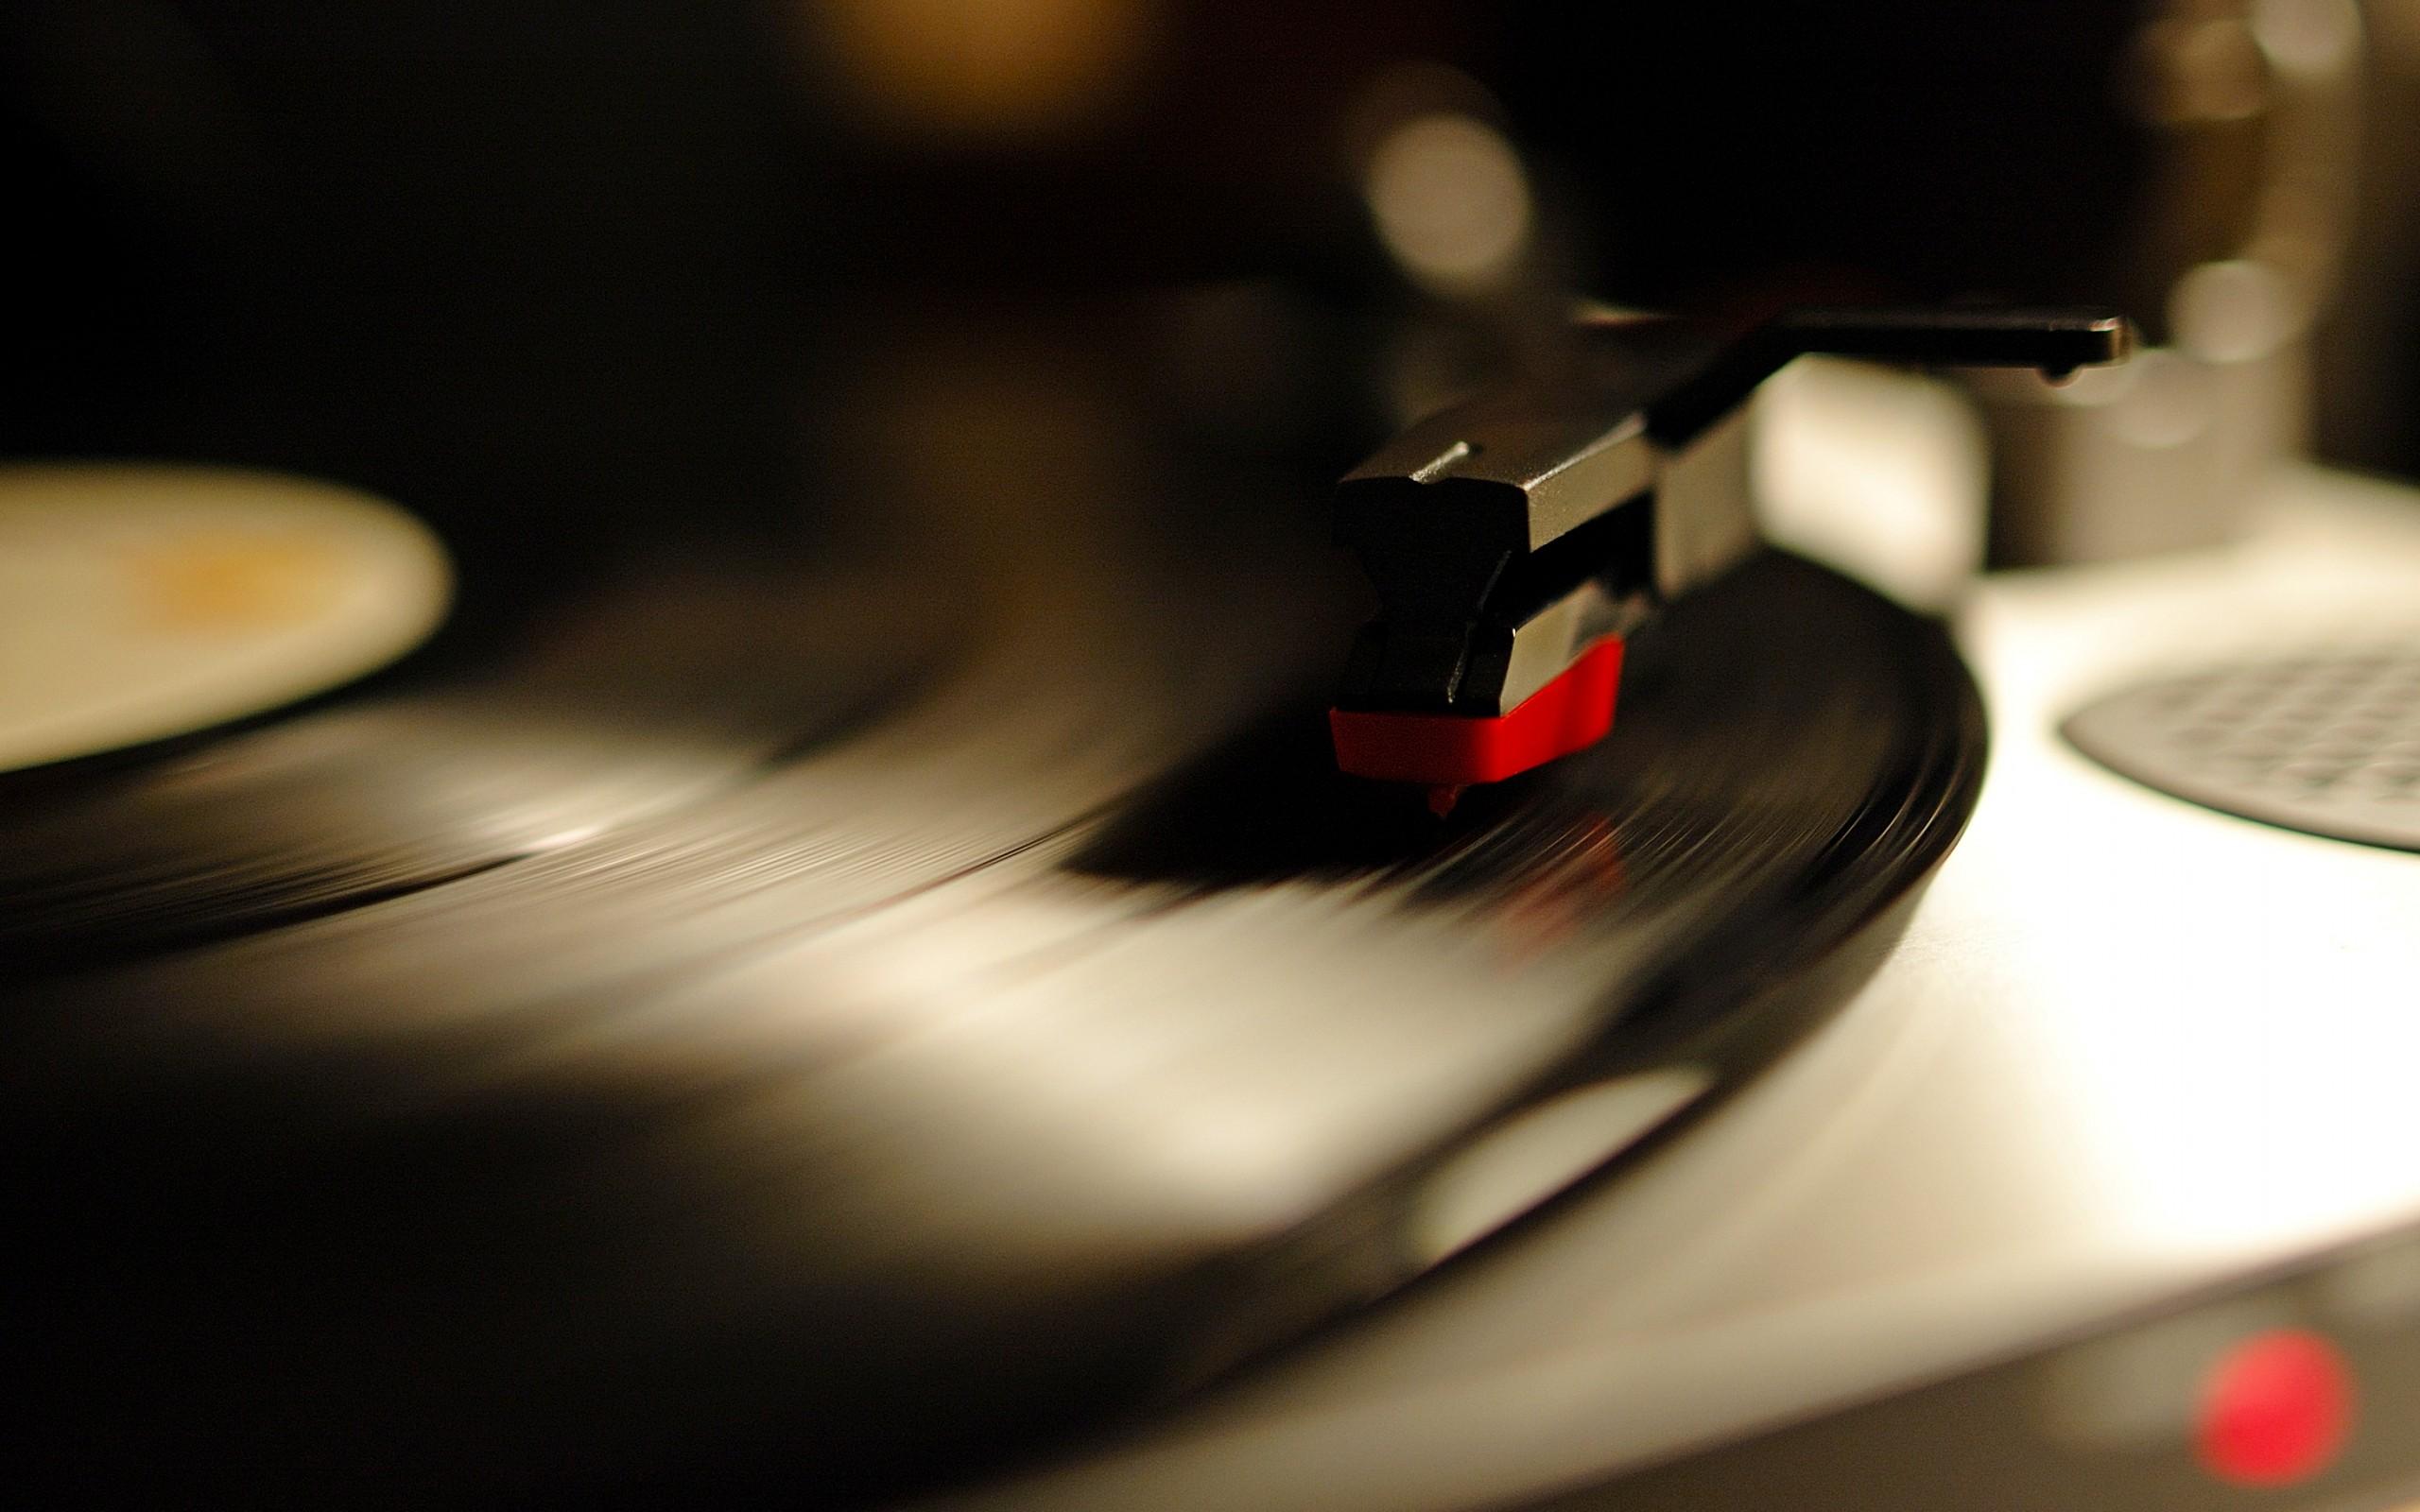 2560x1600 Gramophone record desktop PC and Mac wallpaper 2560x1600